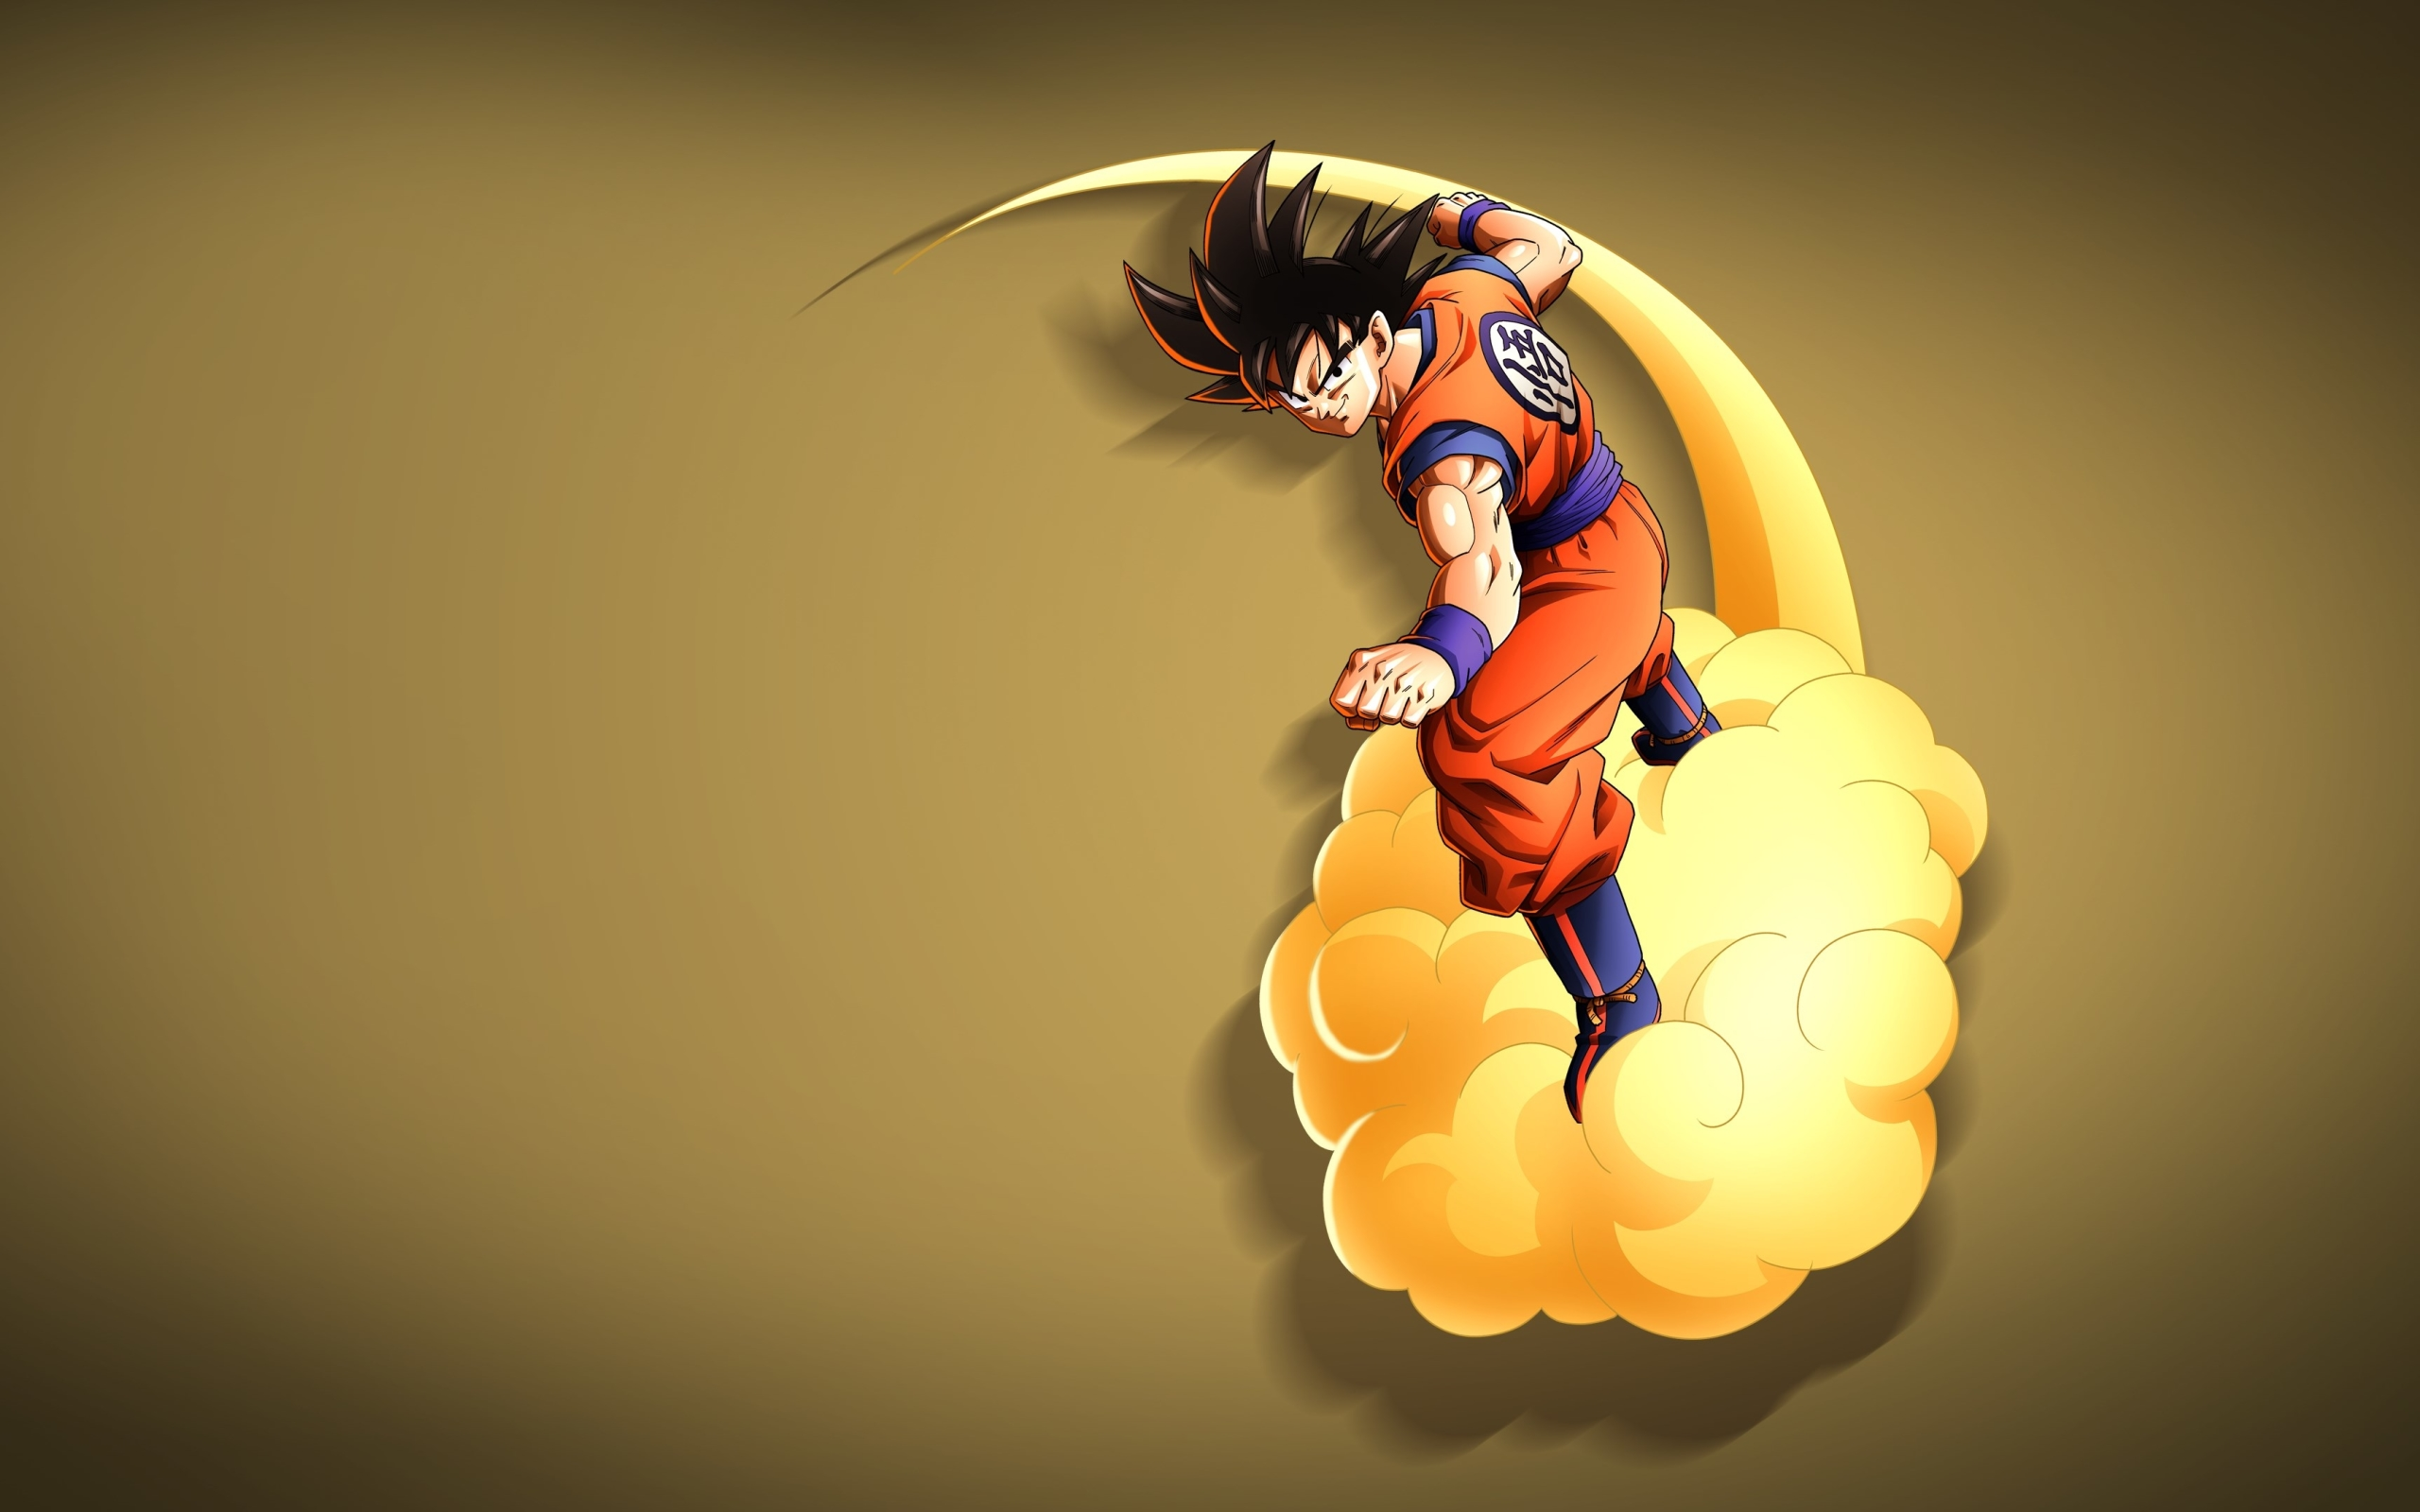 2560x1600 Dragon Ball Z Kakarot 2560x1600 Resolution ...